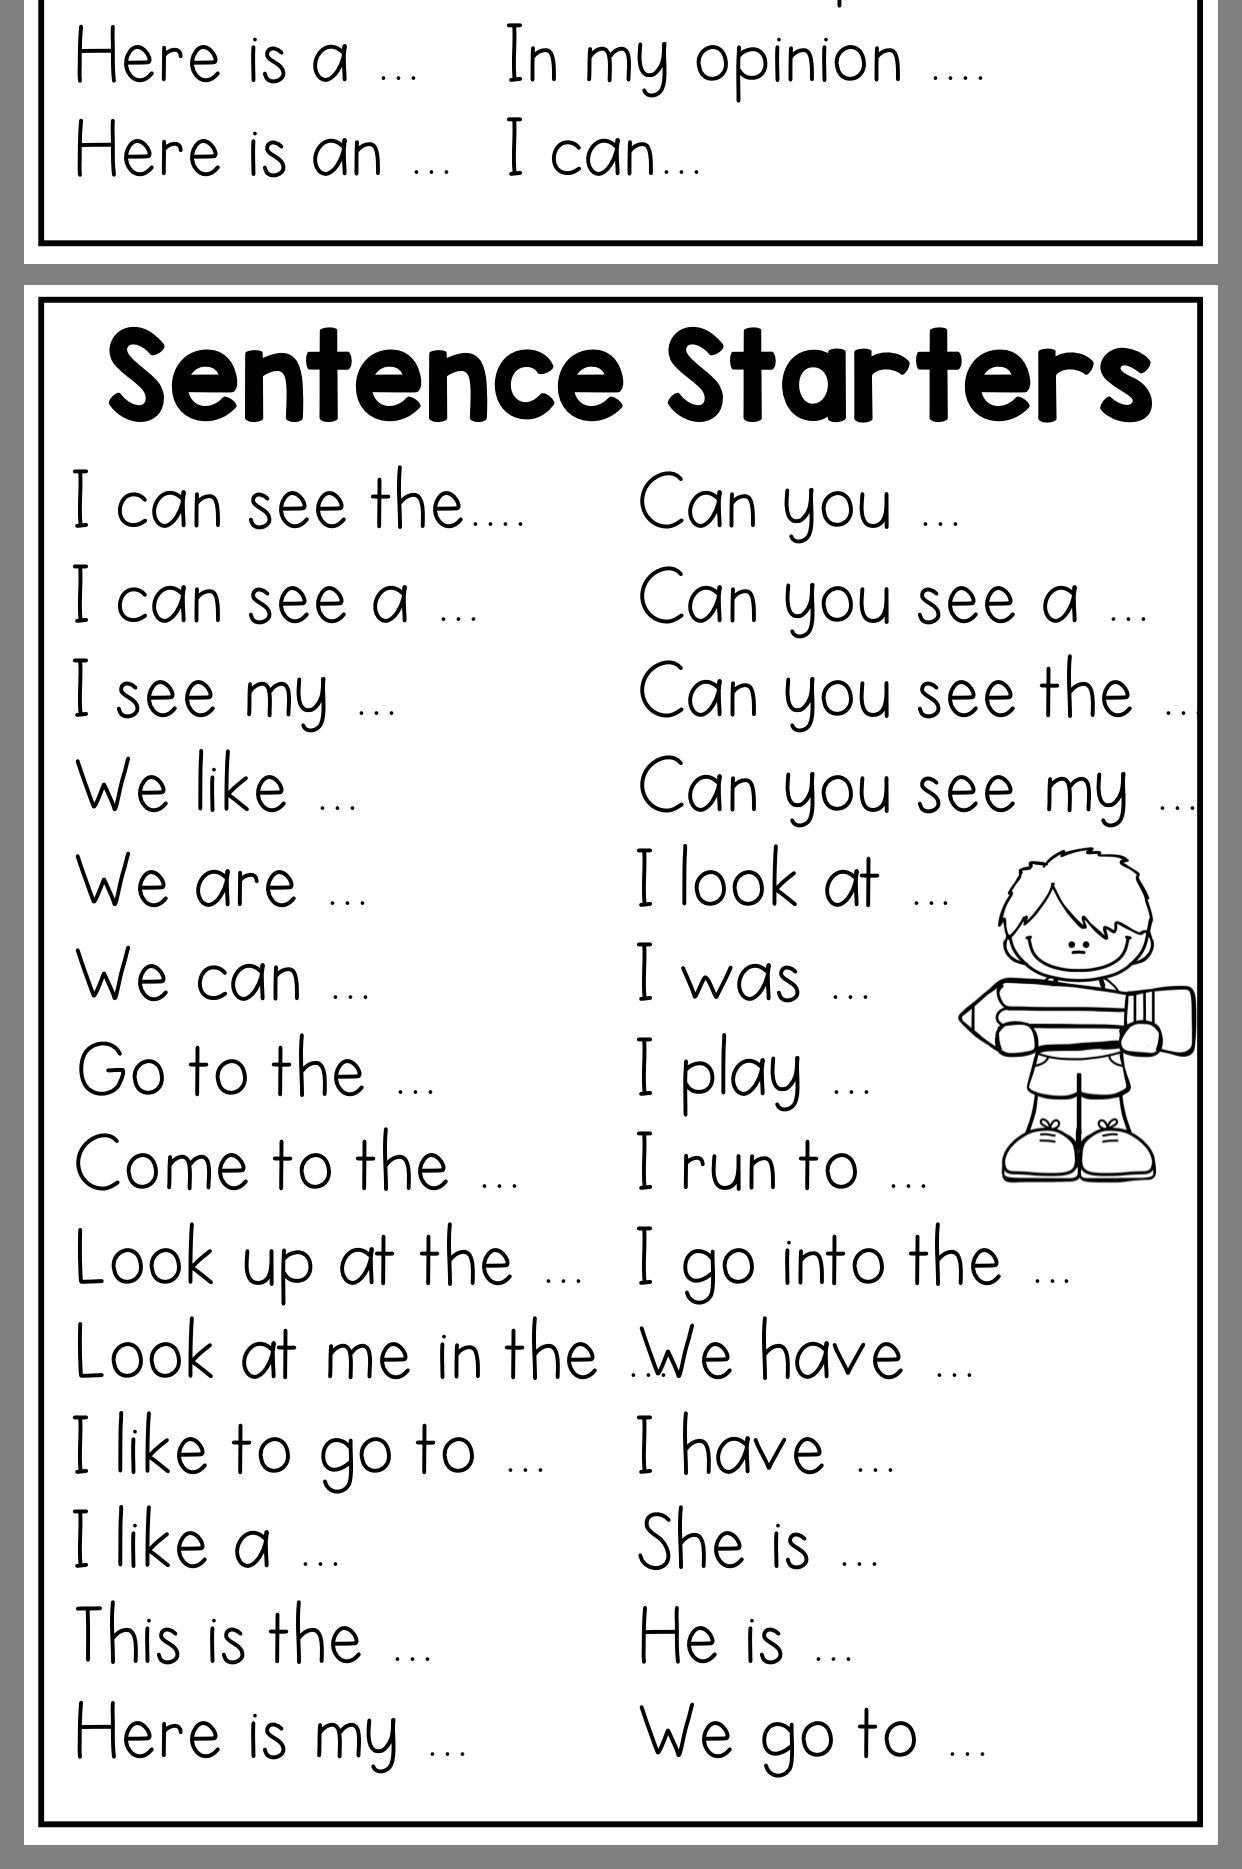 Sentence starter printouts kinder writing, work on writing